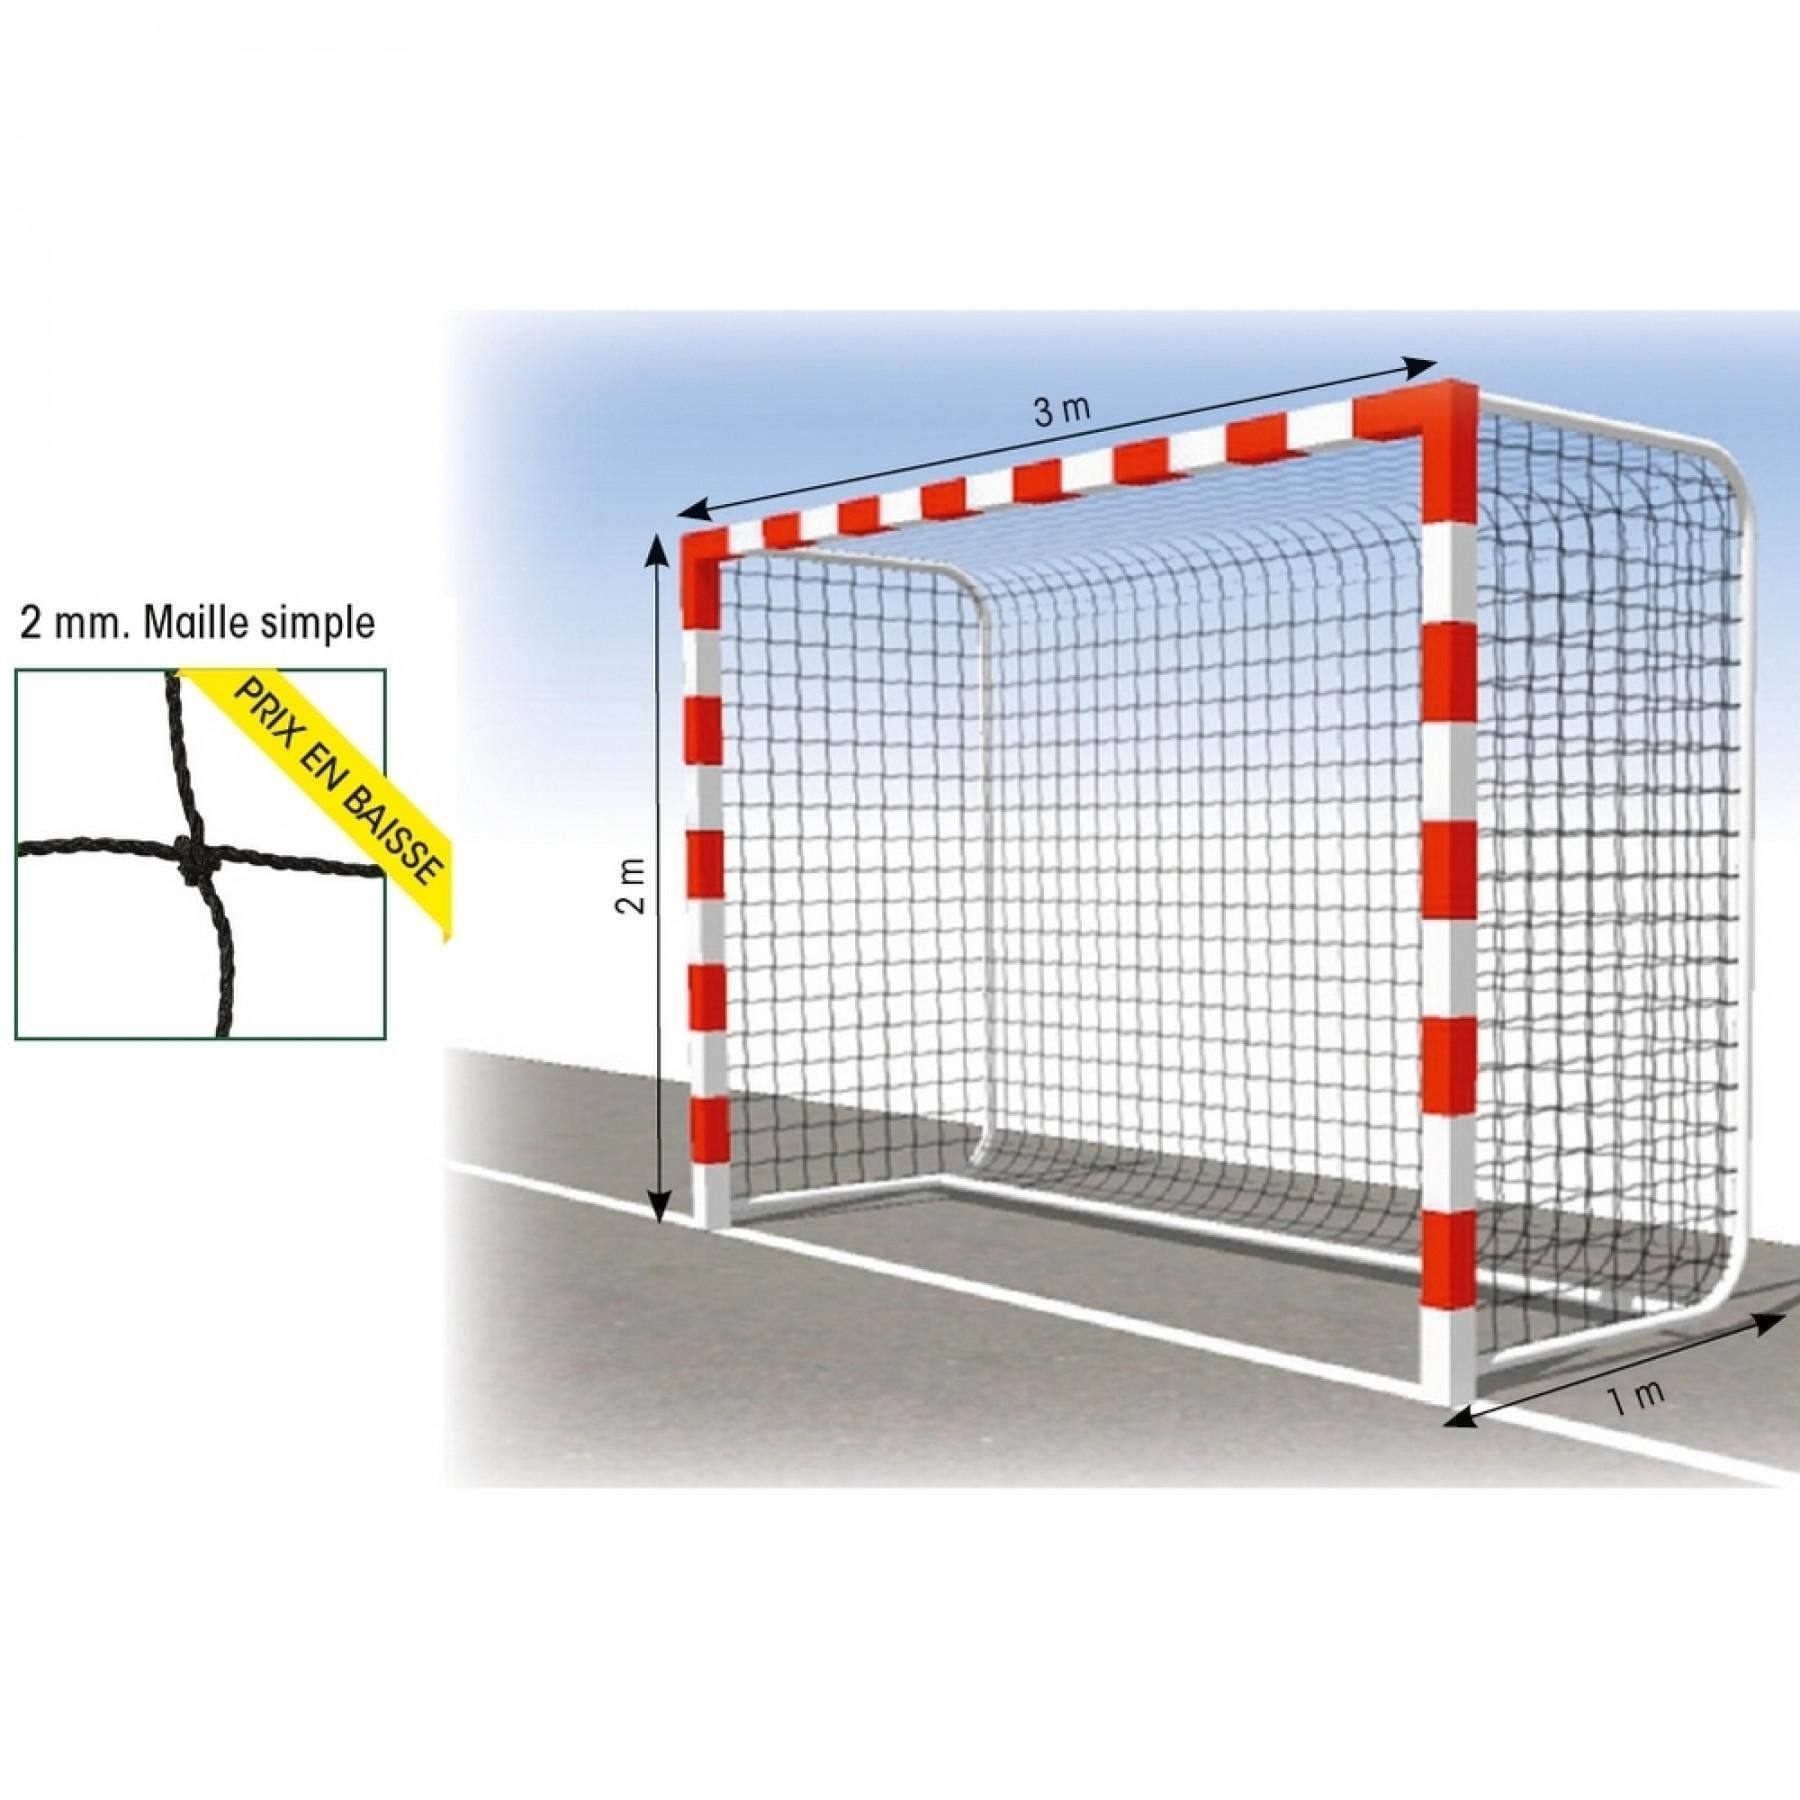 handball net 2 mm Tremblay MS (x2)